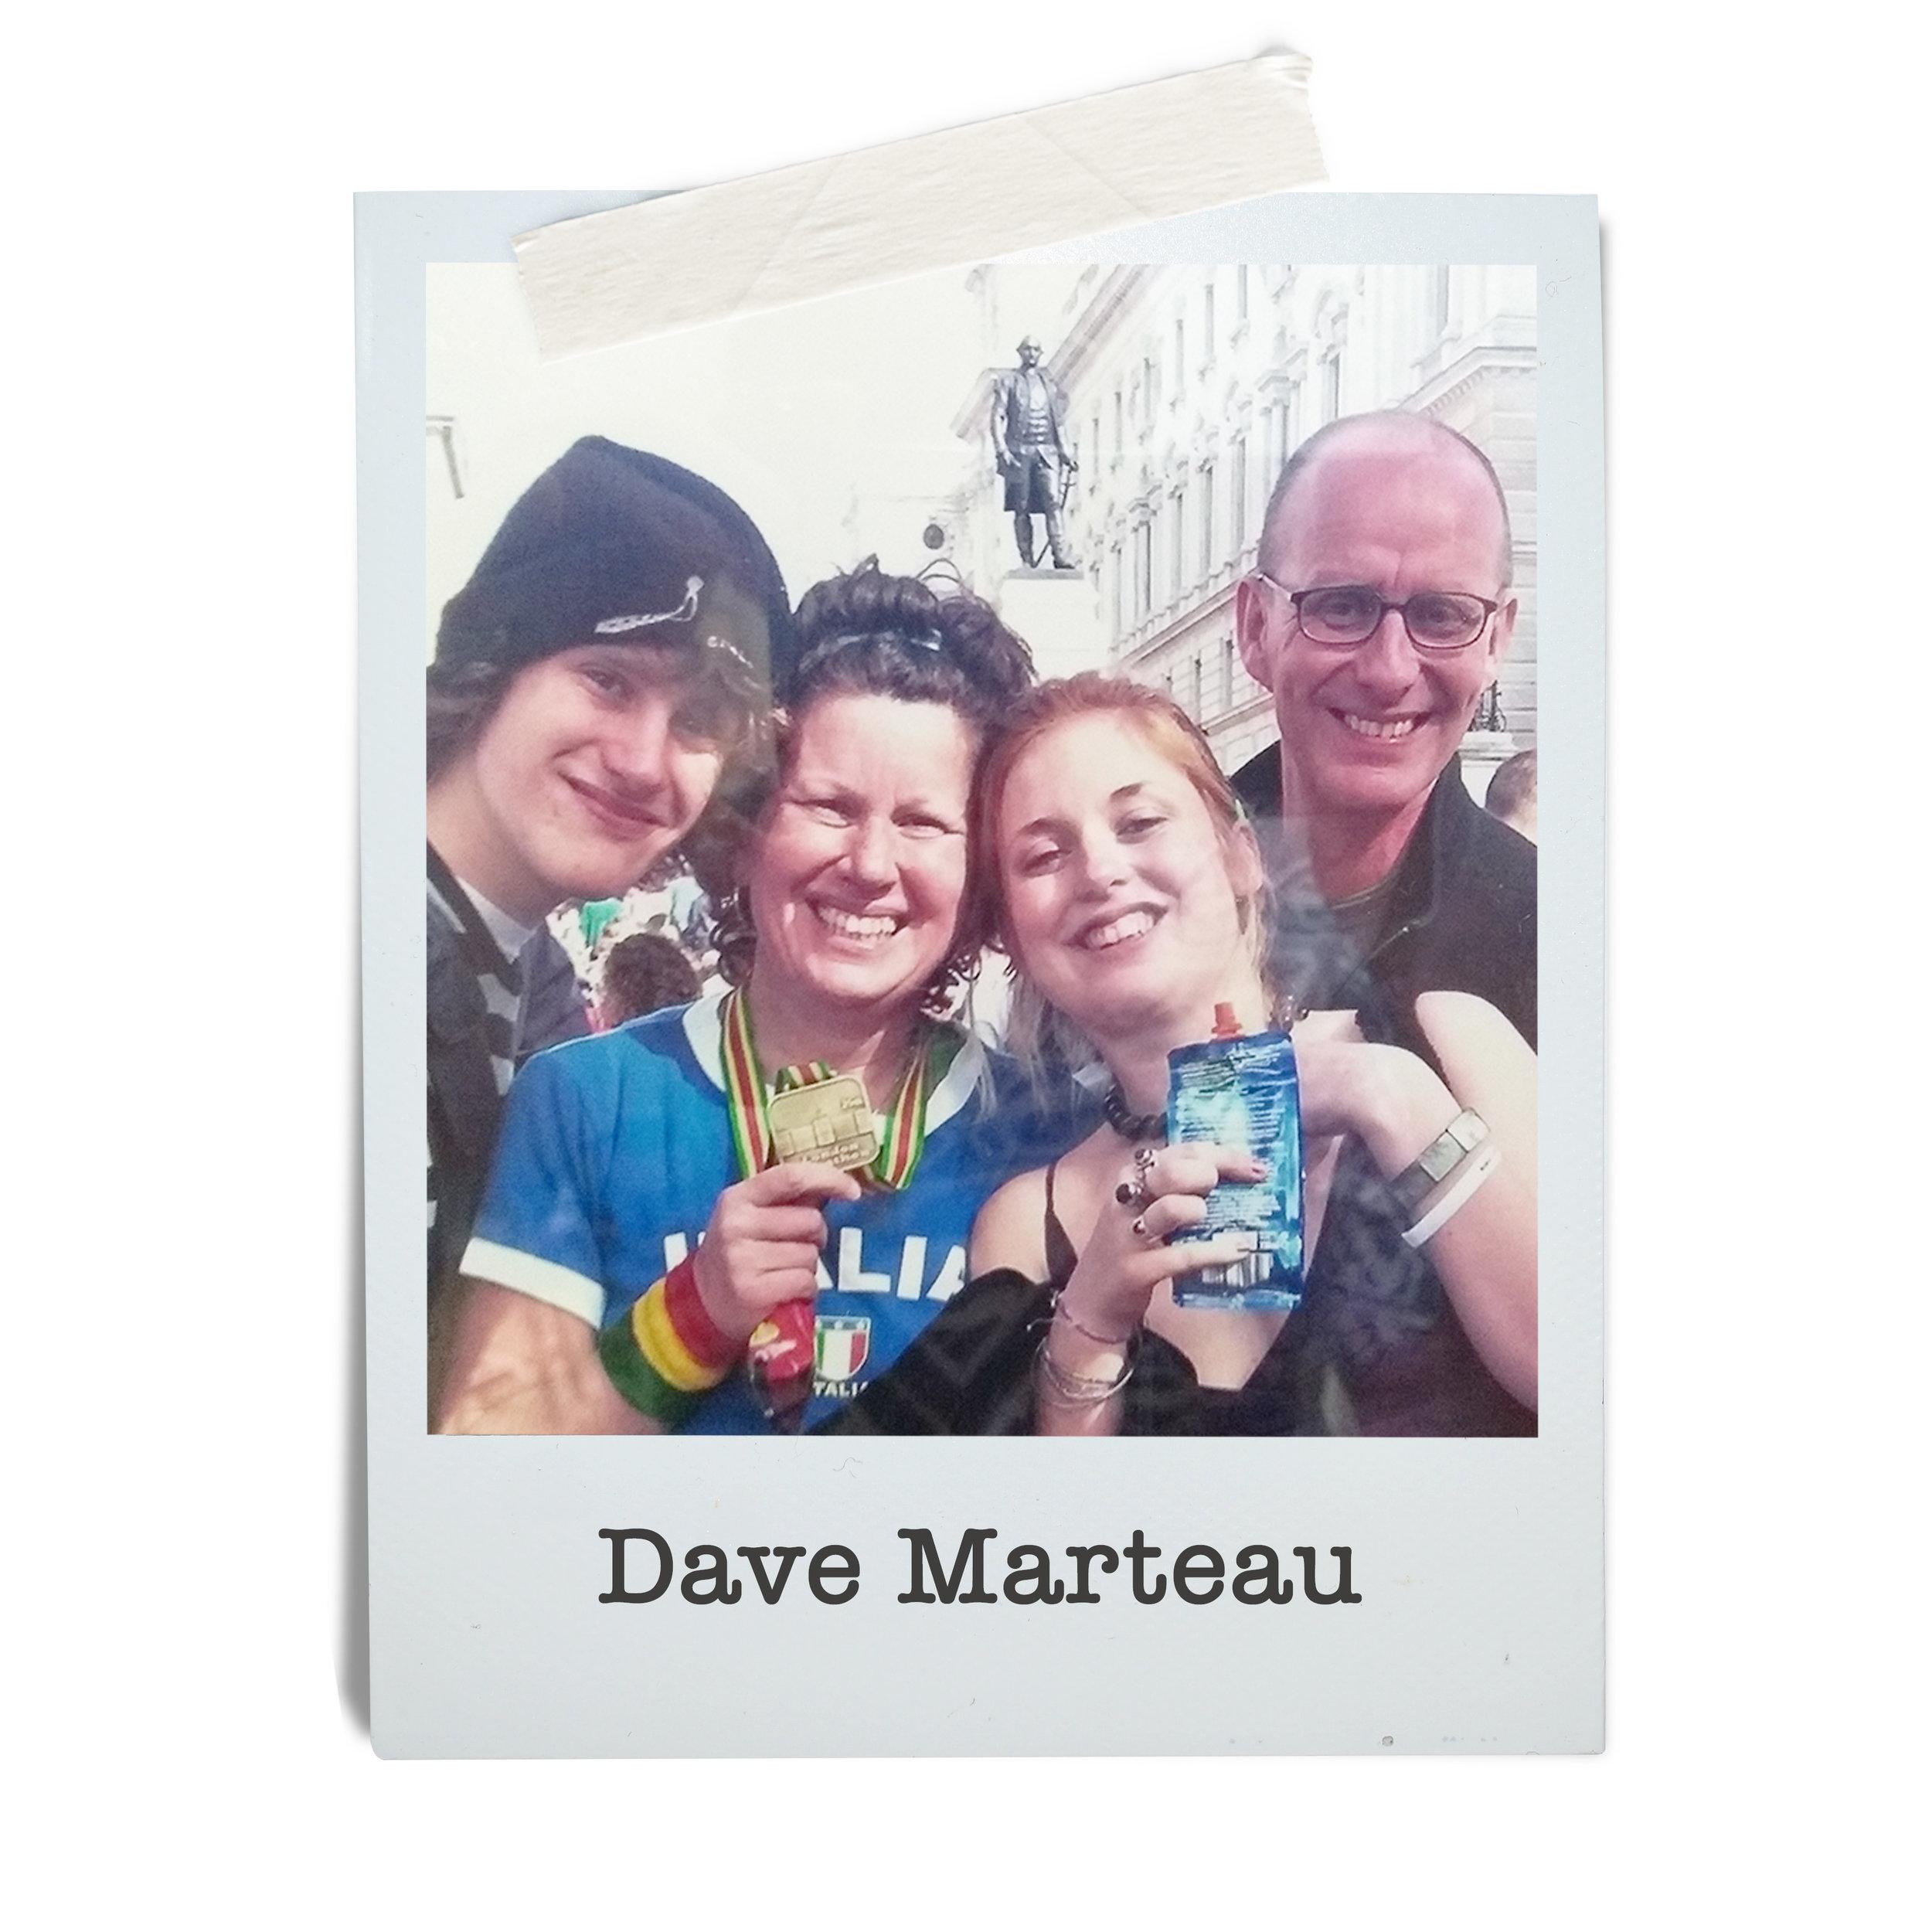 Dave Marteau